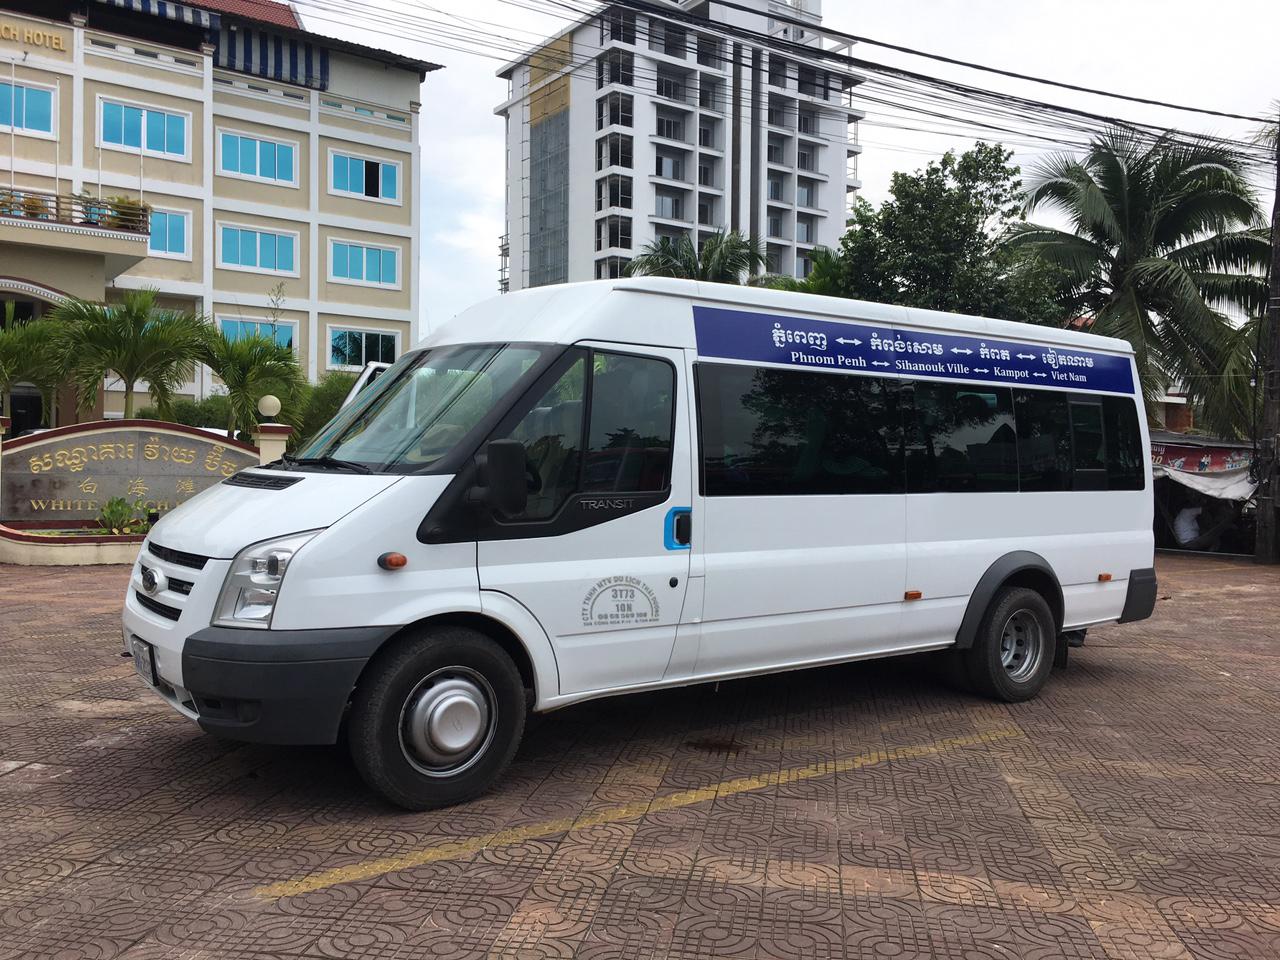 xe tdha tien di sihanoukville 1 1 - Combo du lịch - vé xe và vé tàu sihanouk ville